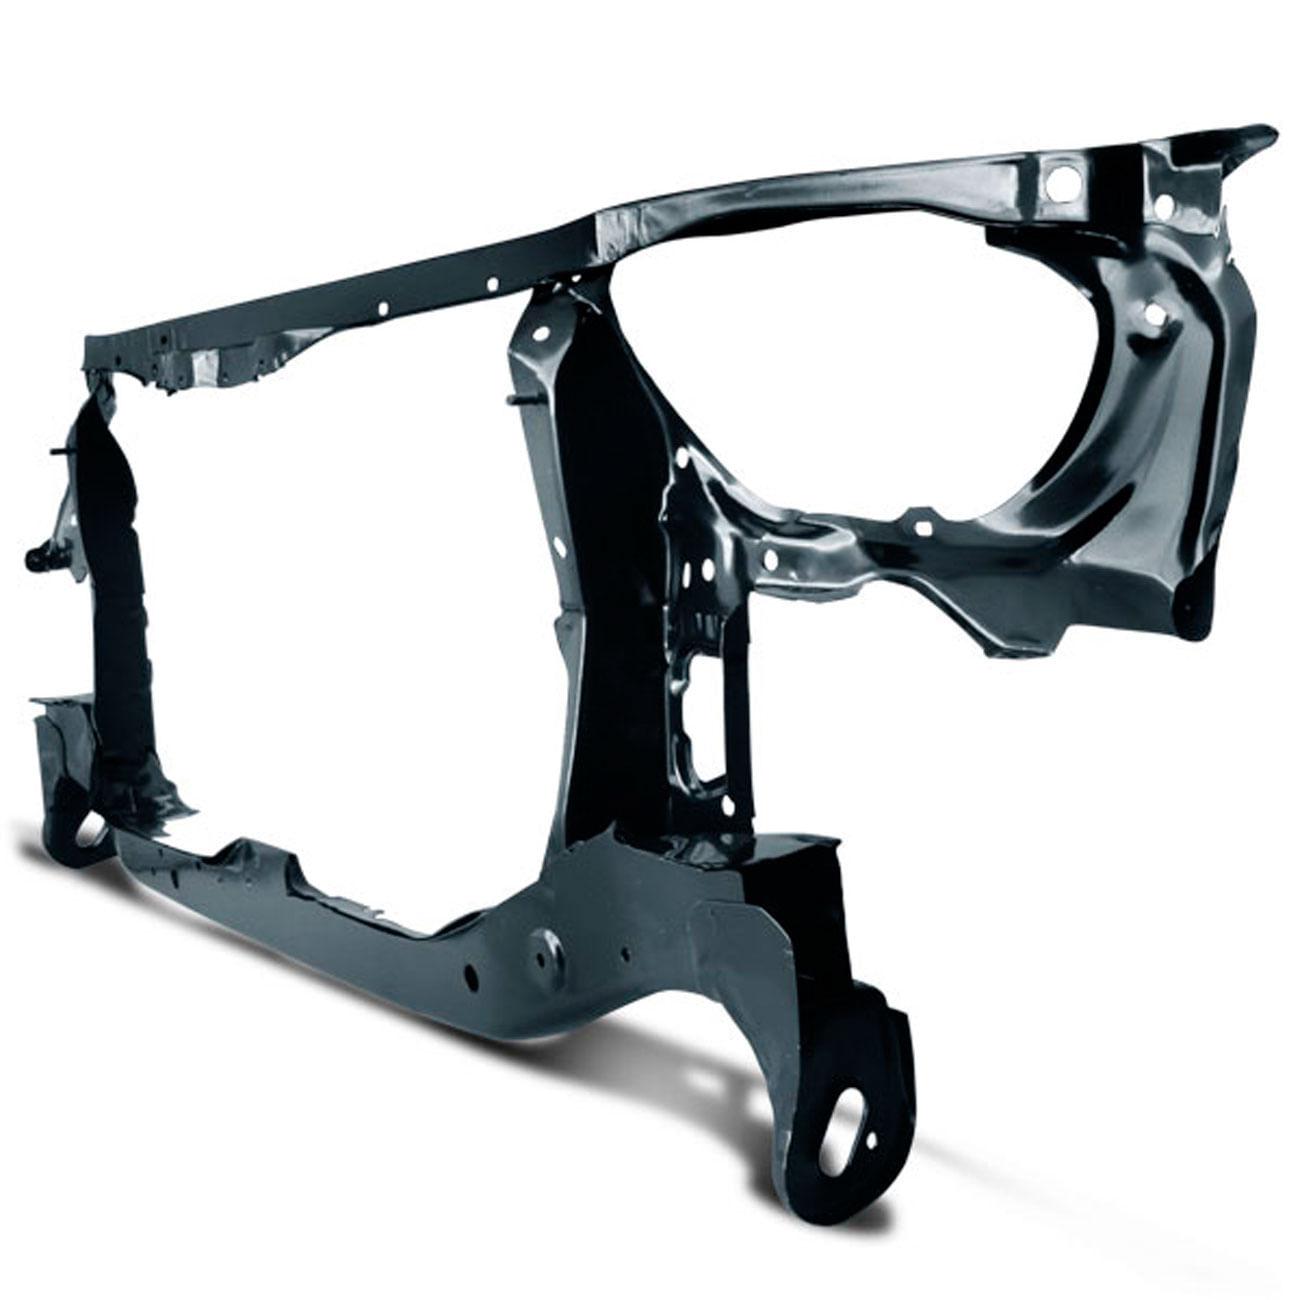 Painel Frontal Suporte Radiador Corolla 98 99 00 01 02